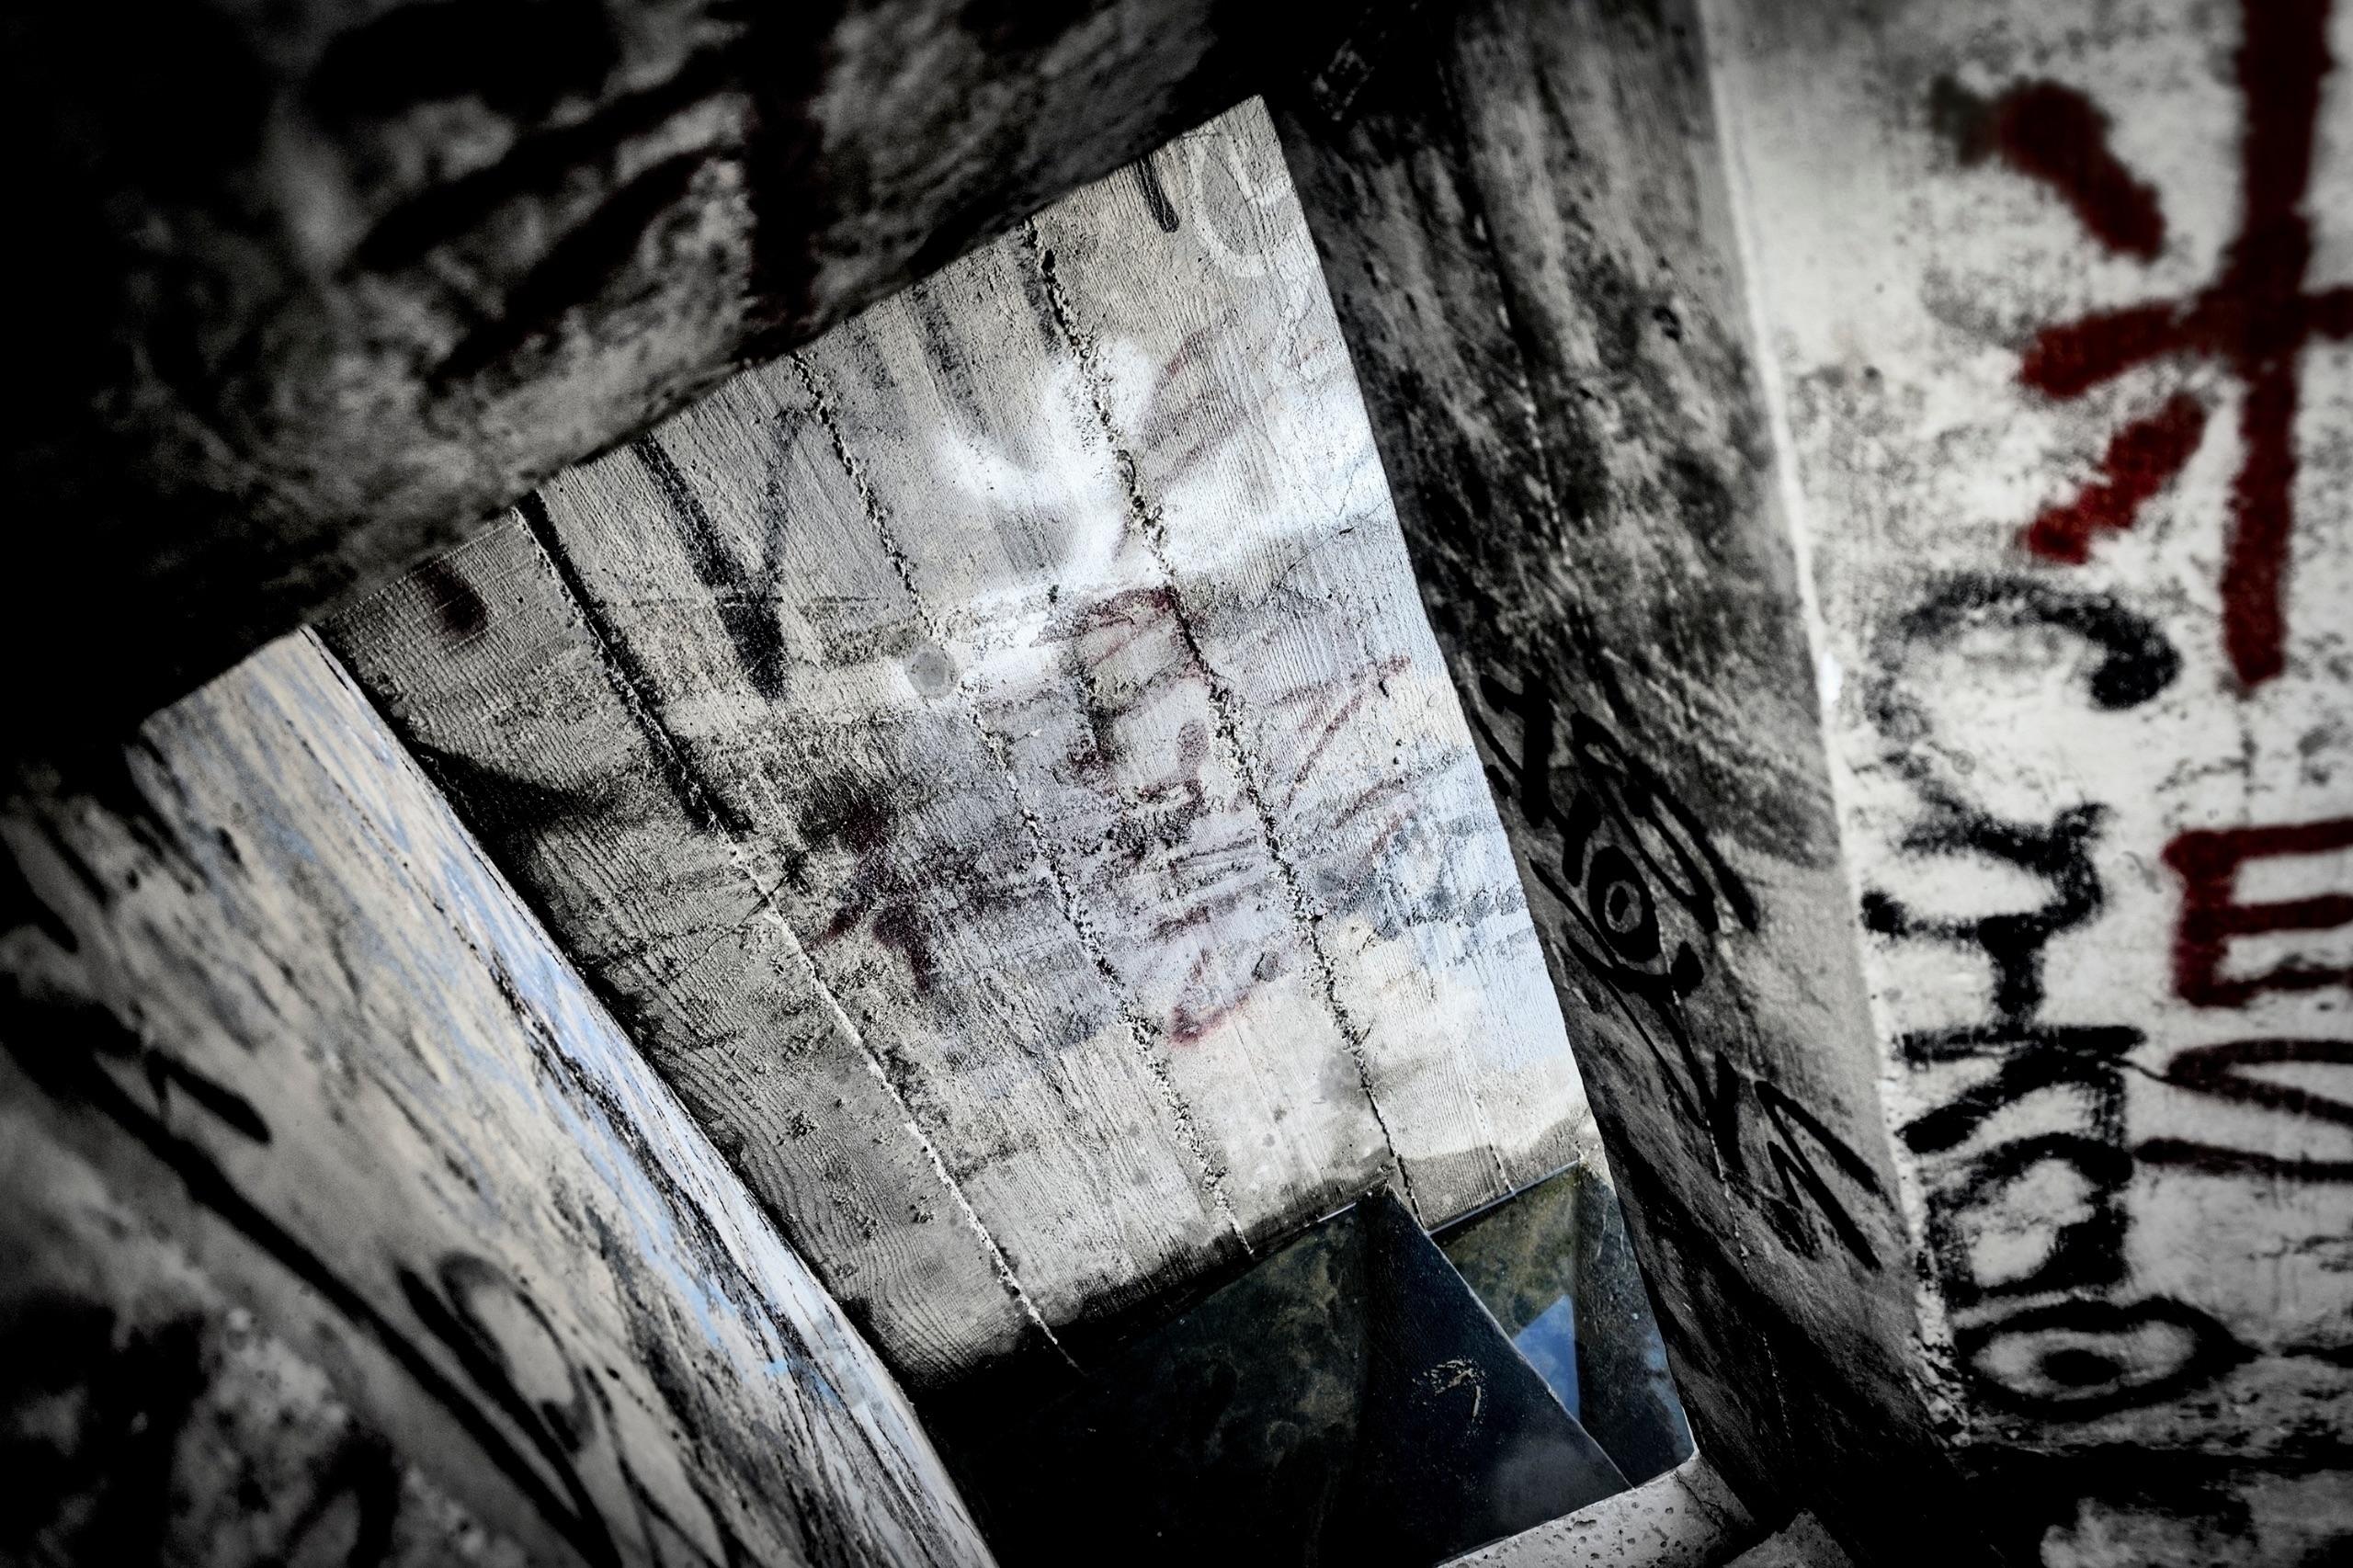 Private Hermann lived bunker mo - philippe_schoen | ello